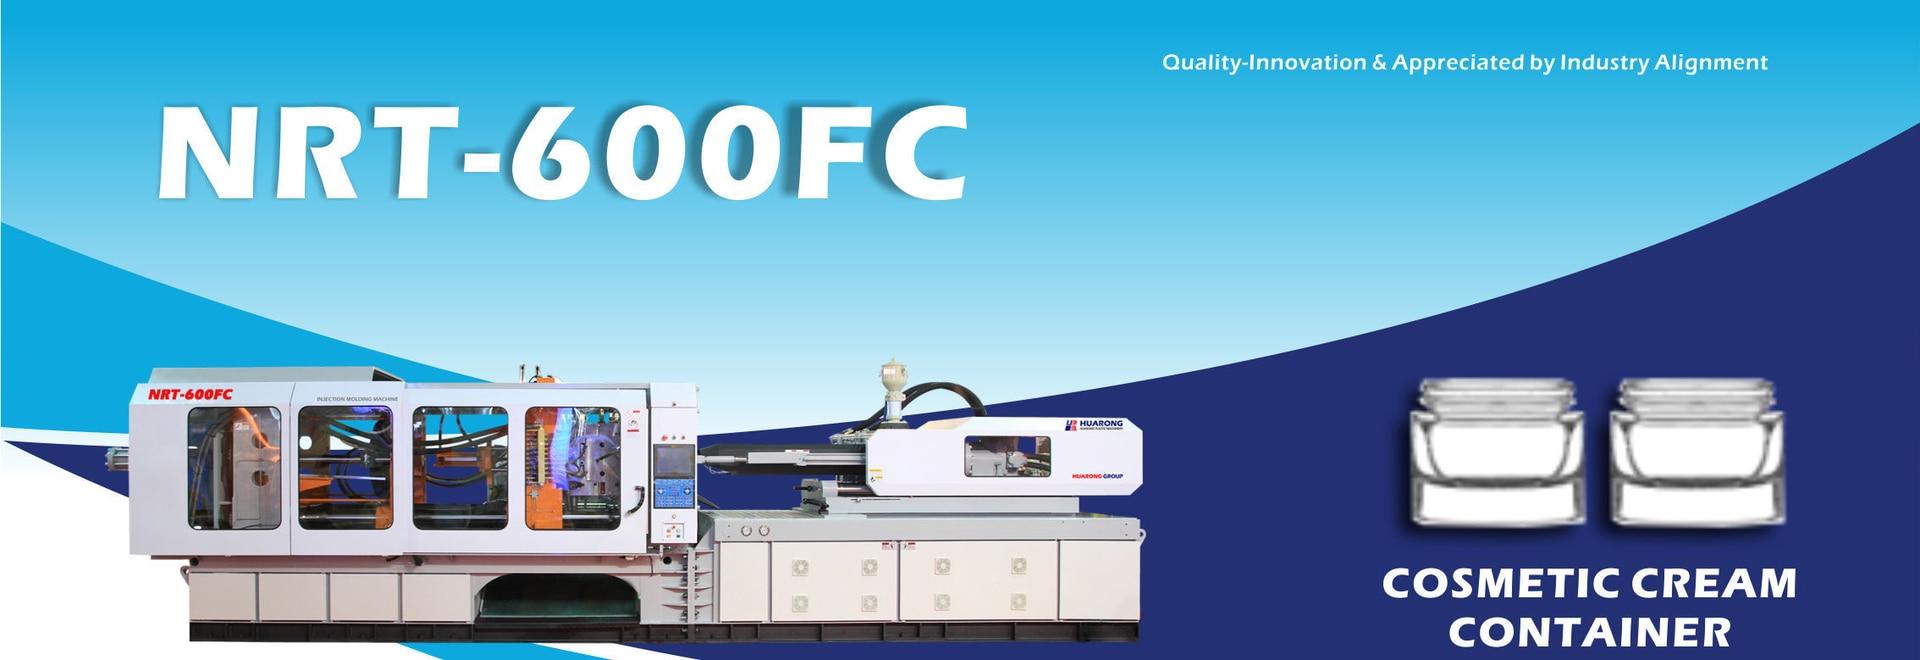 HUARONG INJECTION MOLDING MACHINE MOLDING MACHINE Servo System HR-600ton confezione cosmetici